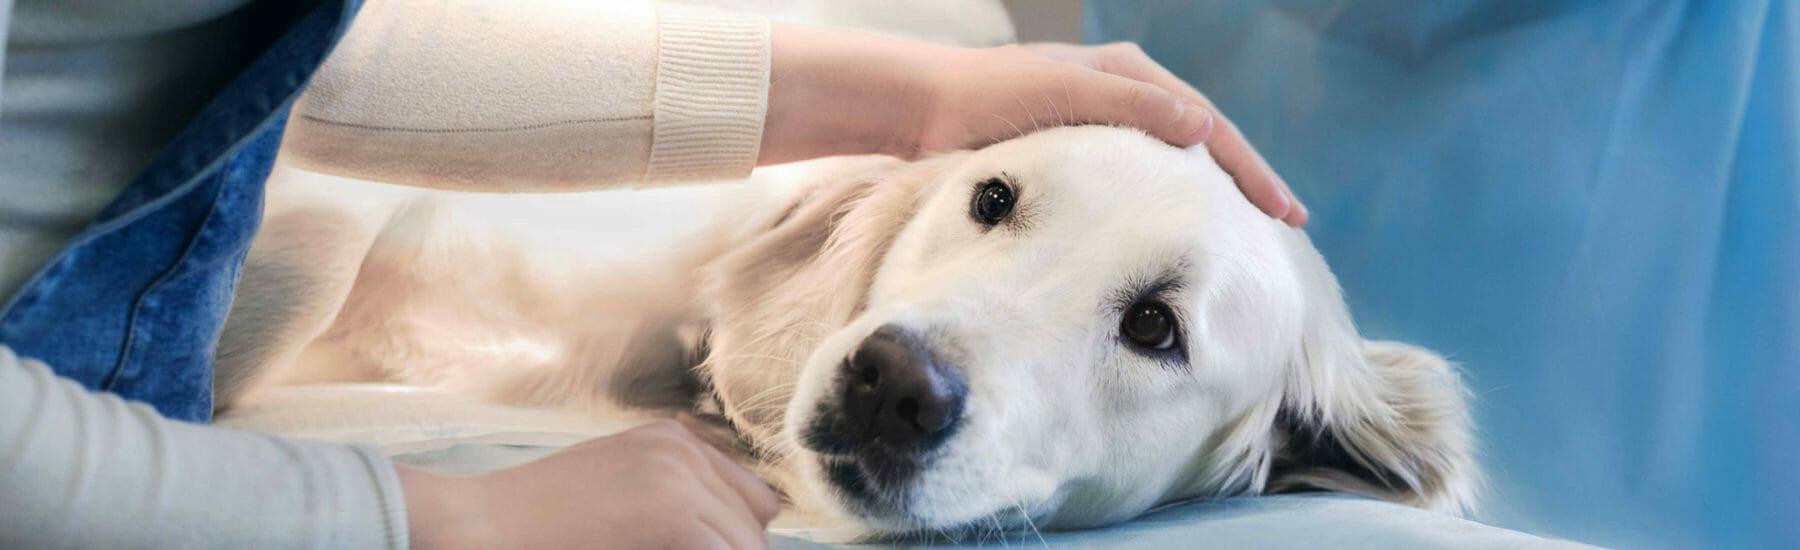 Golden dog getting pet by veterinarian